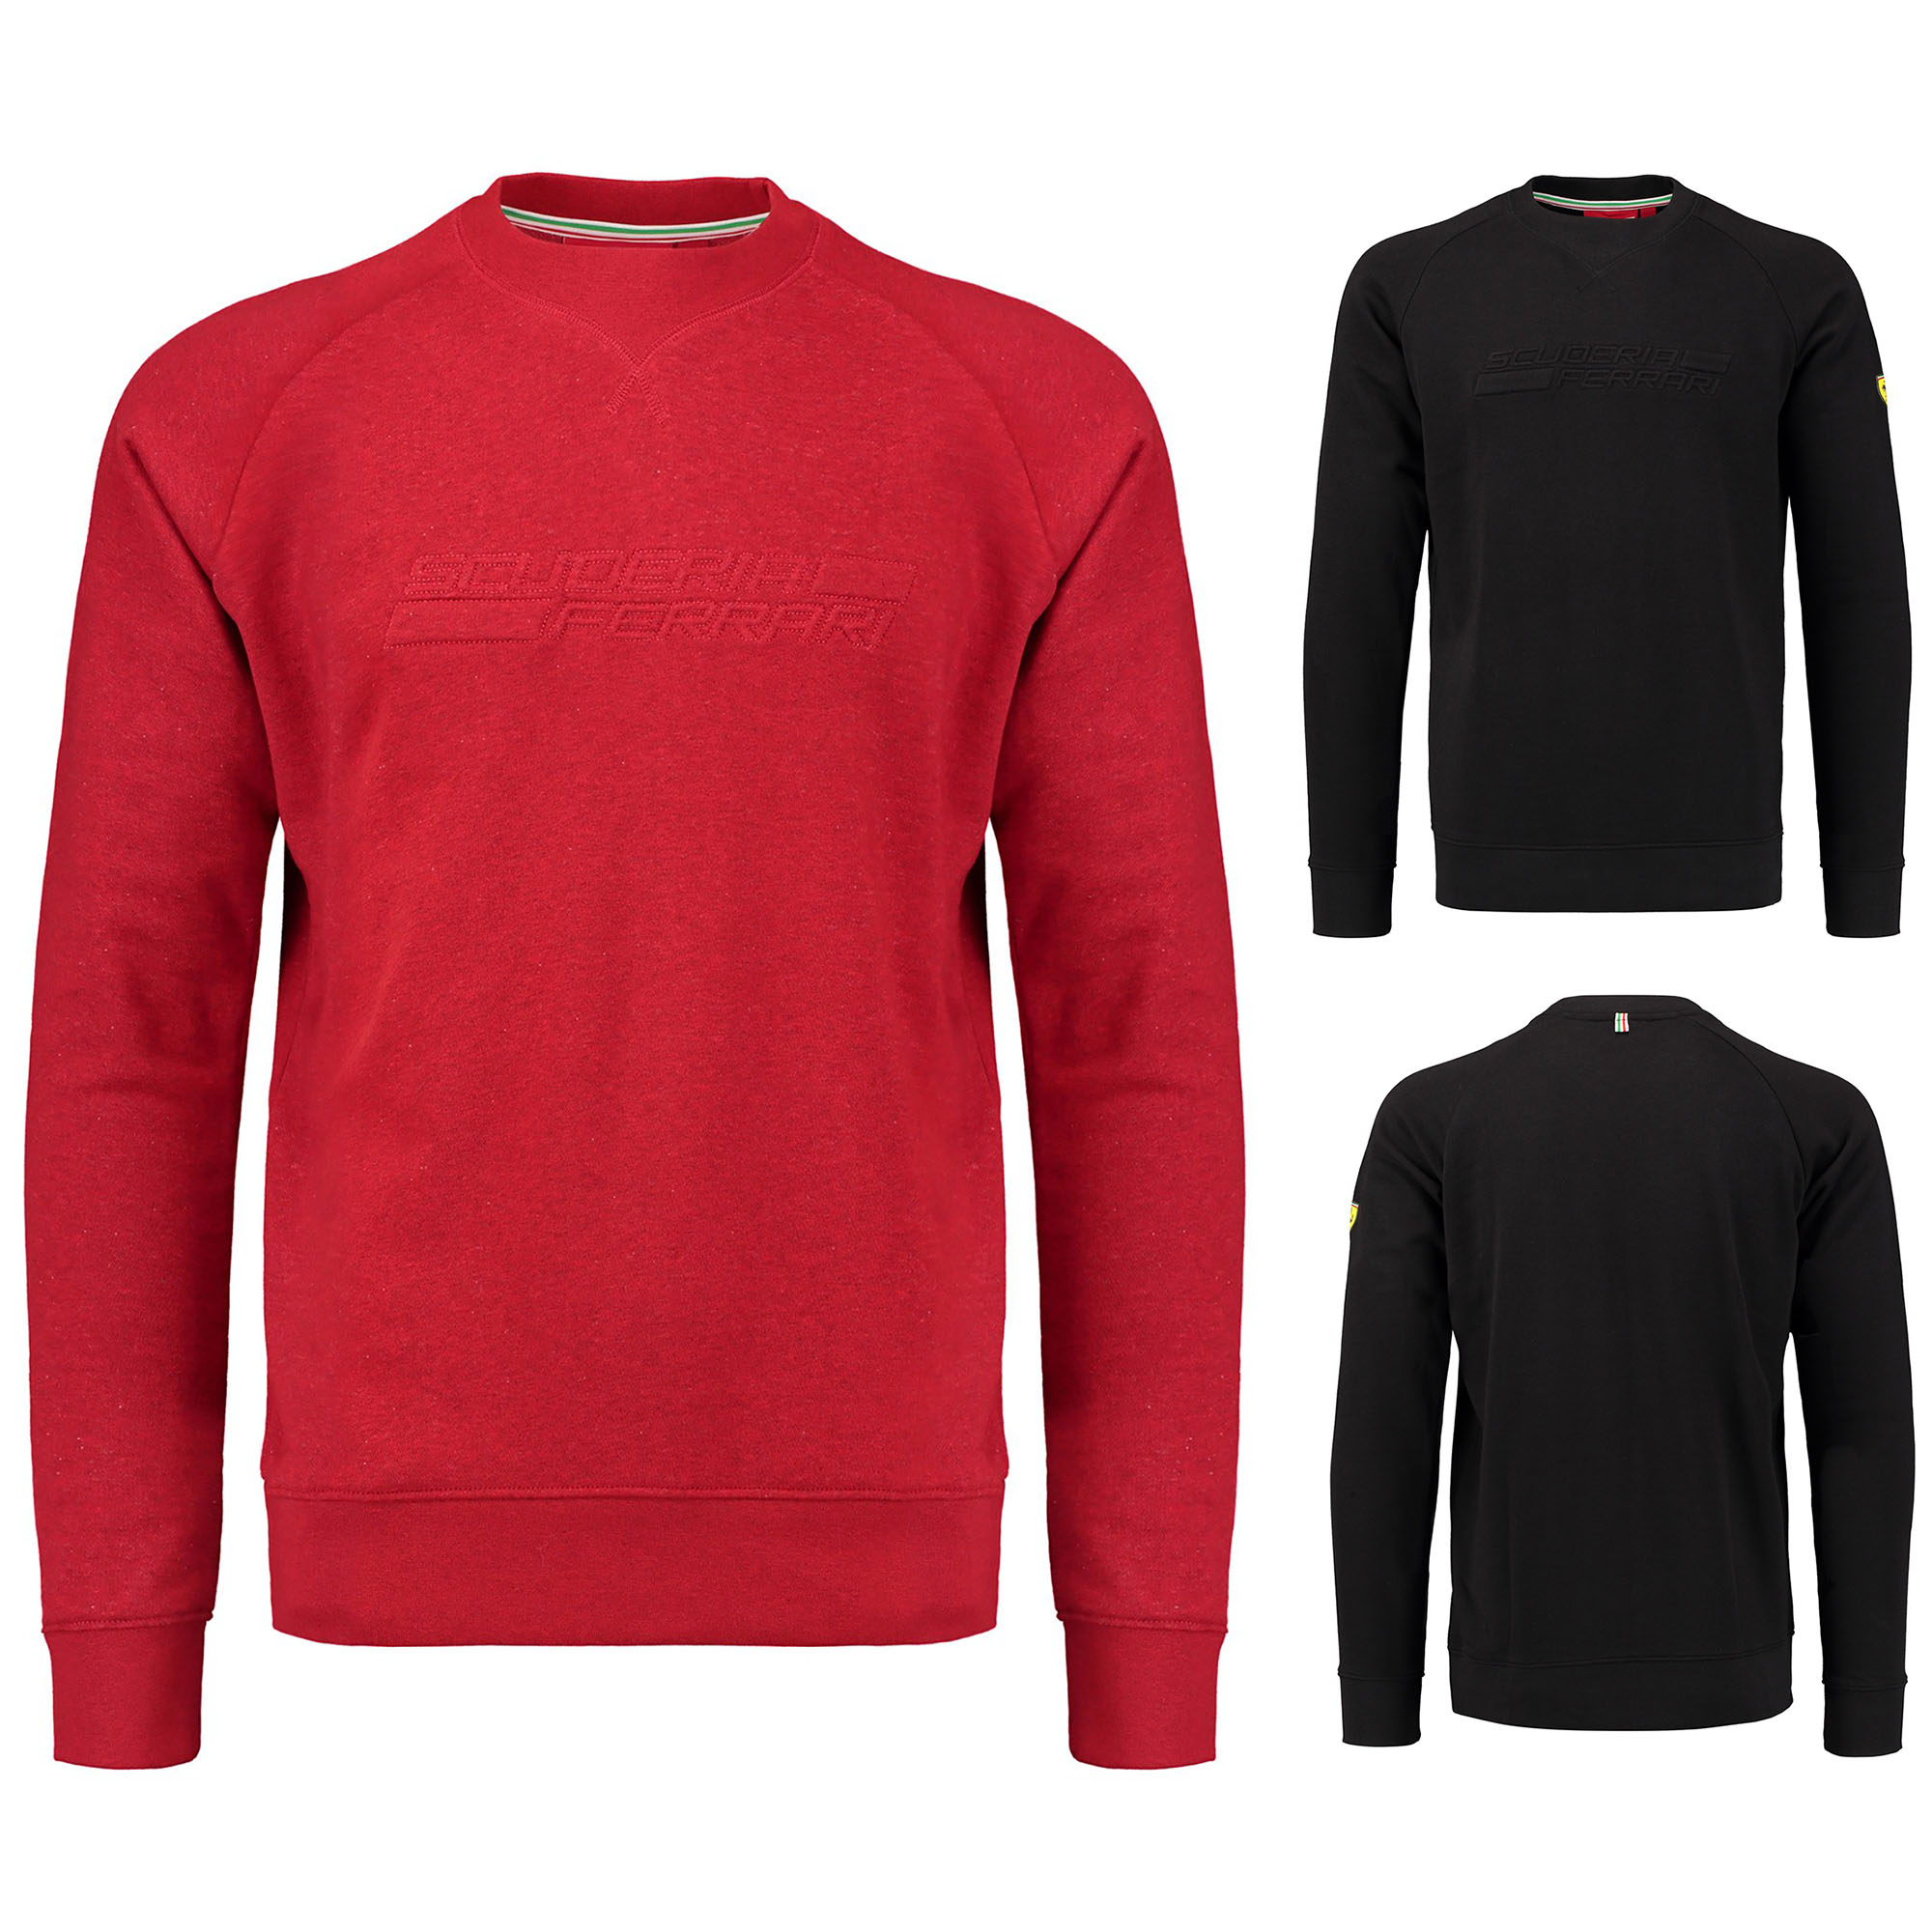 2018 Scuderia Ferrari Mens Mid Layer LONG Sleeve Zip Jumper Sweater Sizes XS-XXL